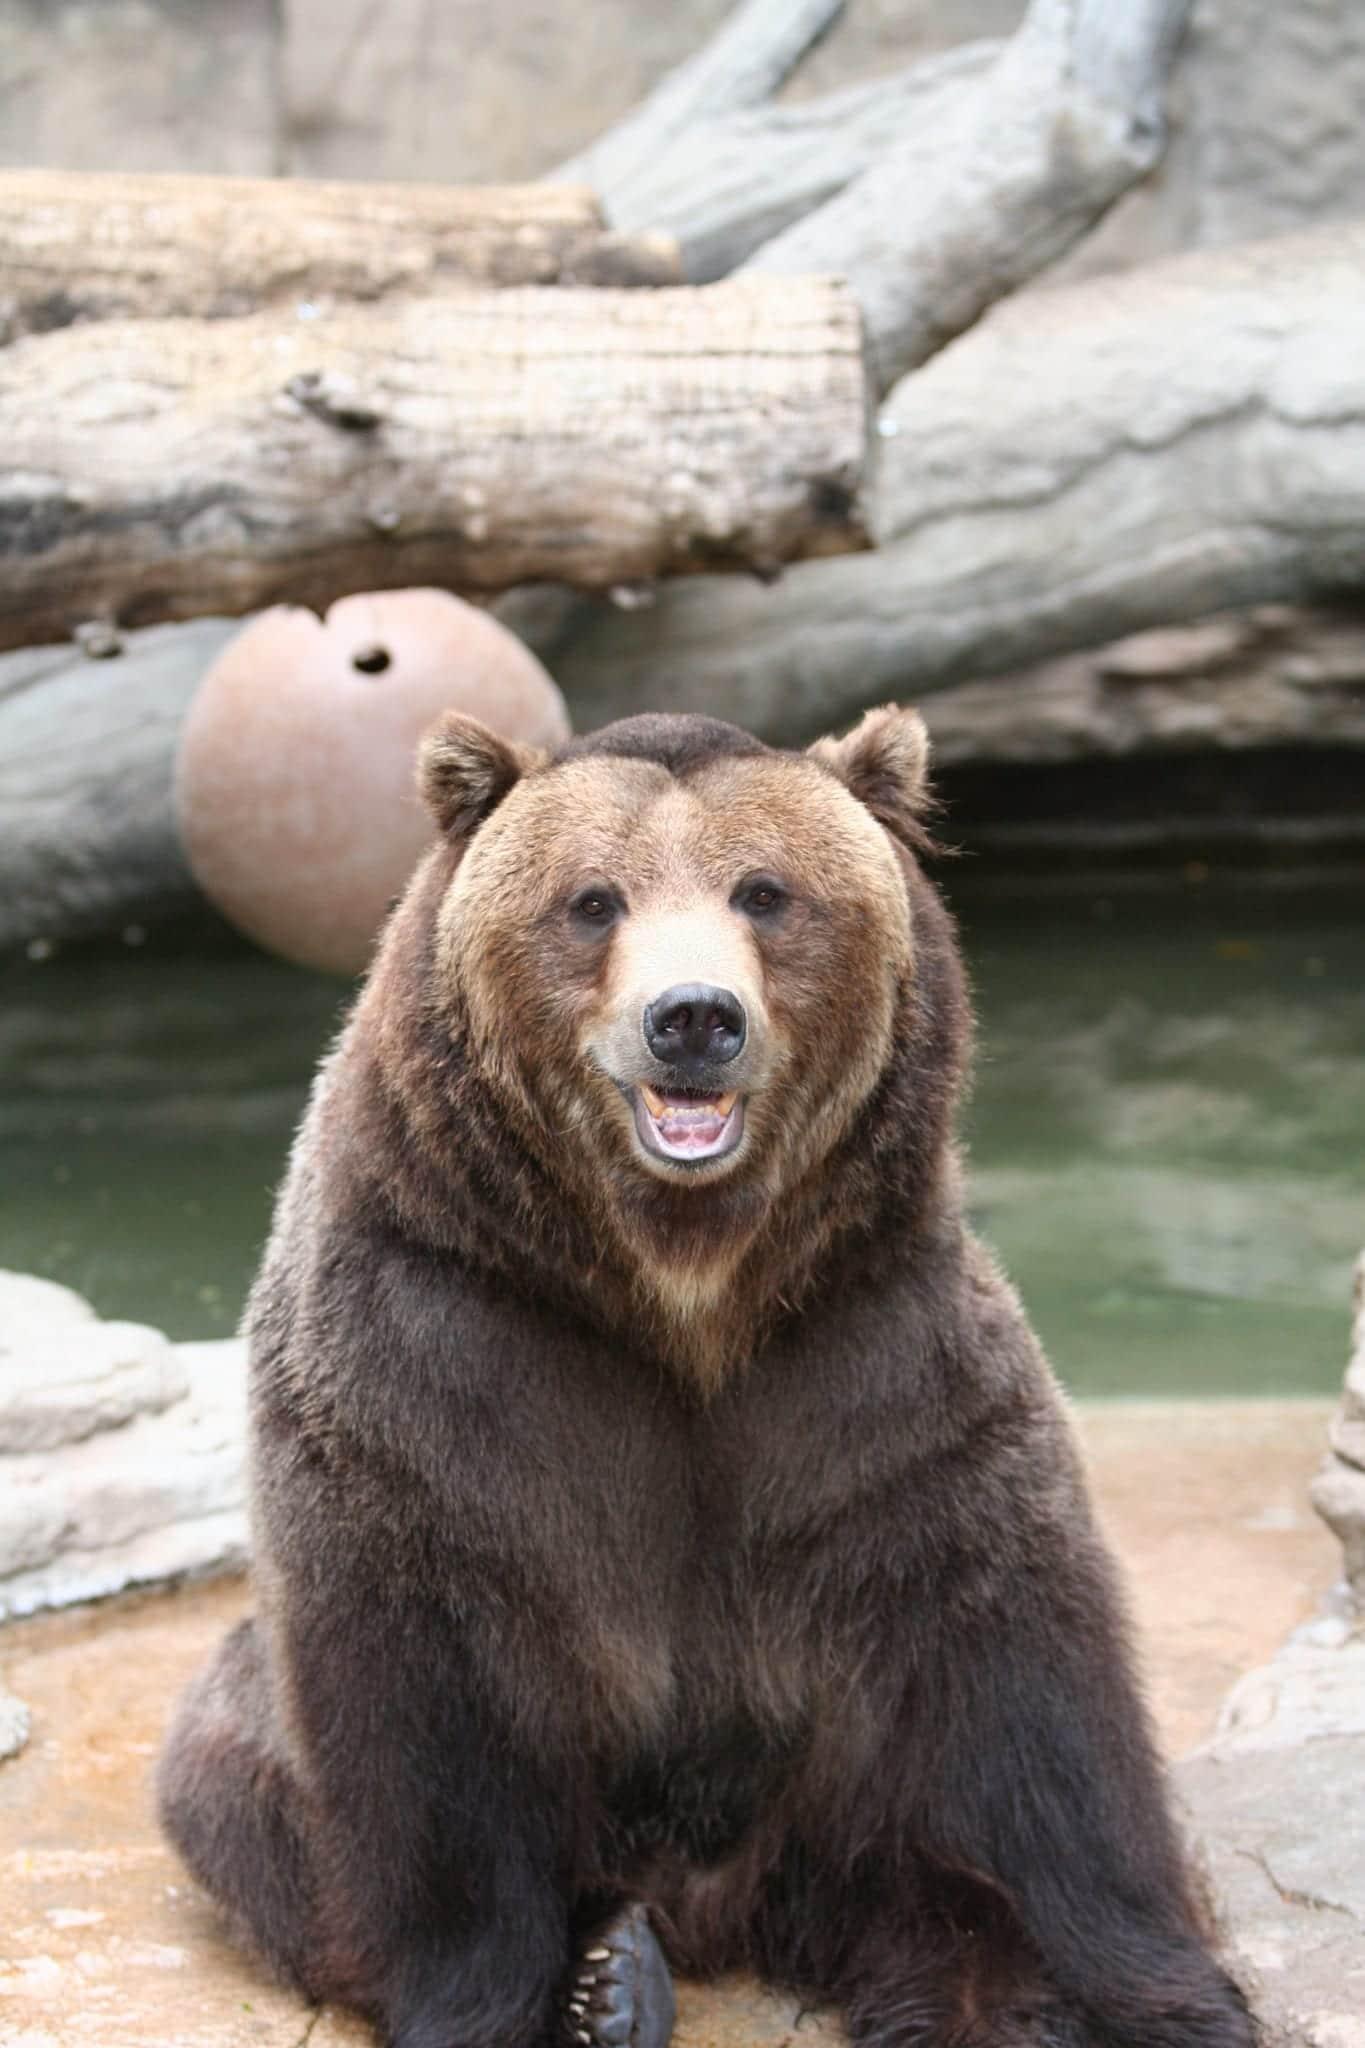 Grizzly Bear Denver Zoo Colorado Portrait